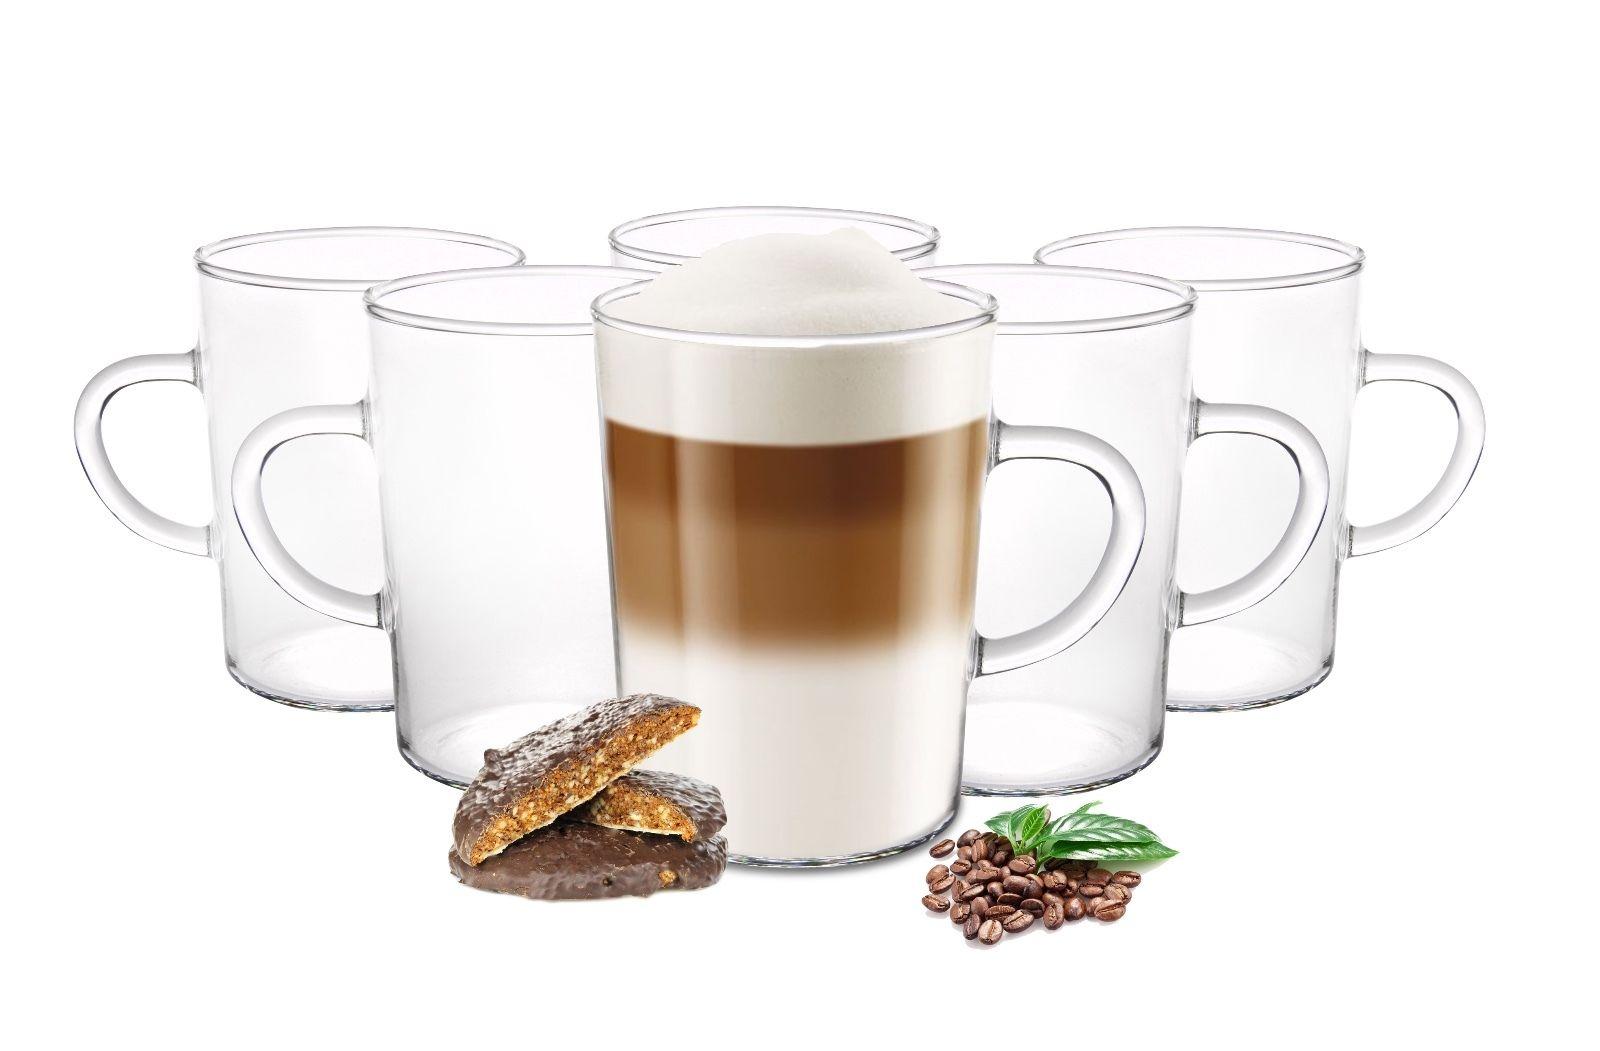 6 kaffeegl ser 220ml mit henkel borosilikat teegl ser latte macchiato gl ser ebay. Black Bedroom Furniture Sets. Home Design Ideas